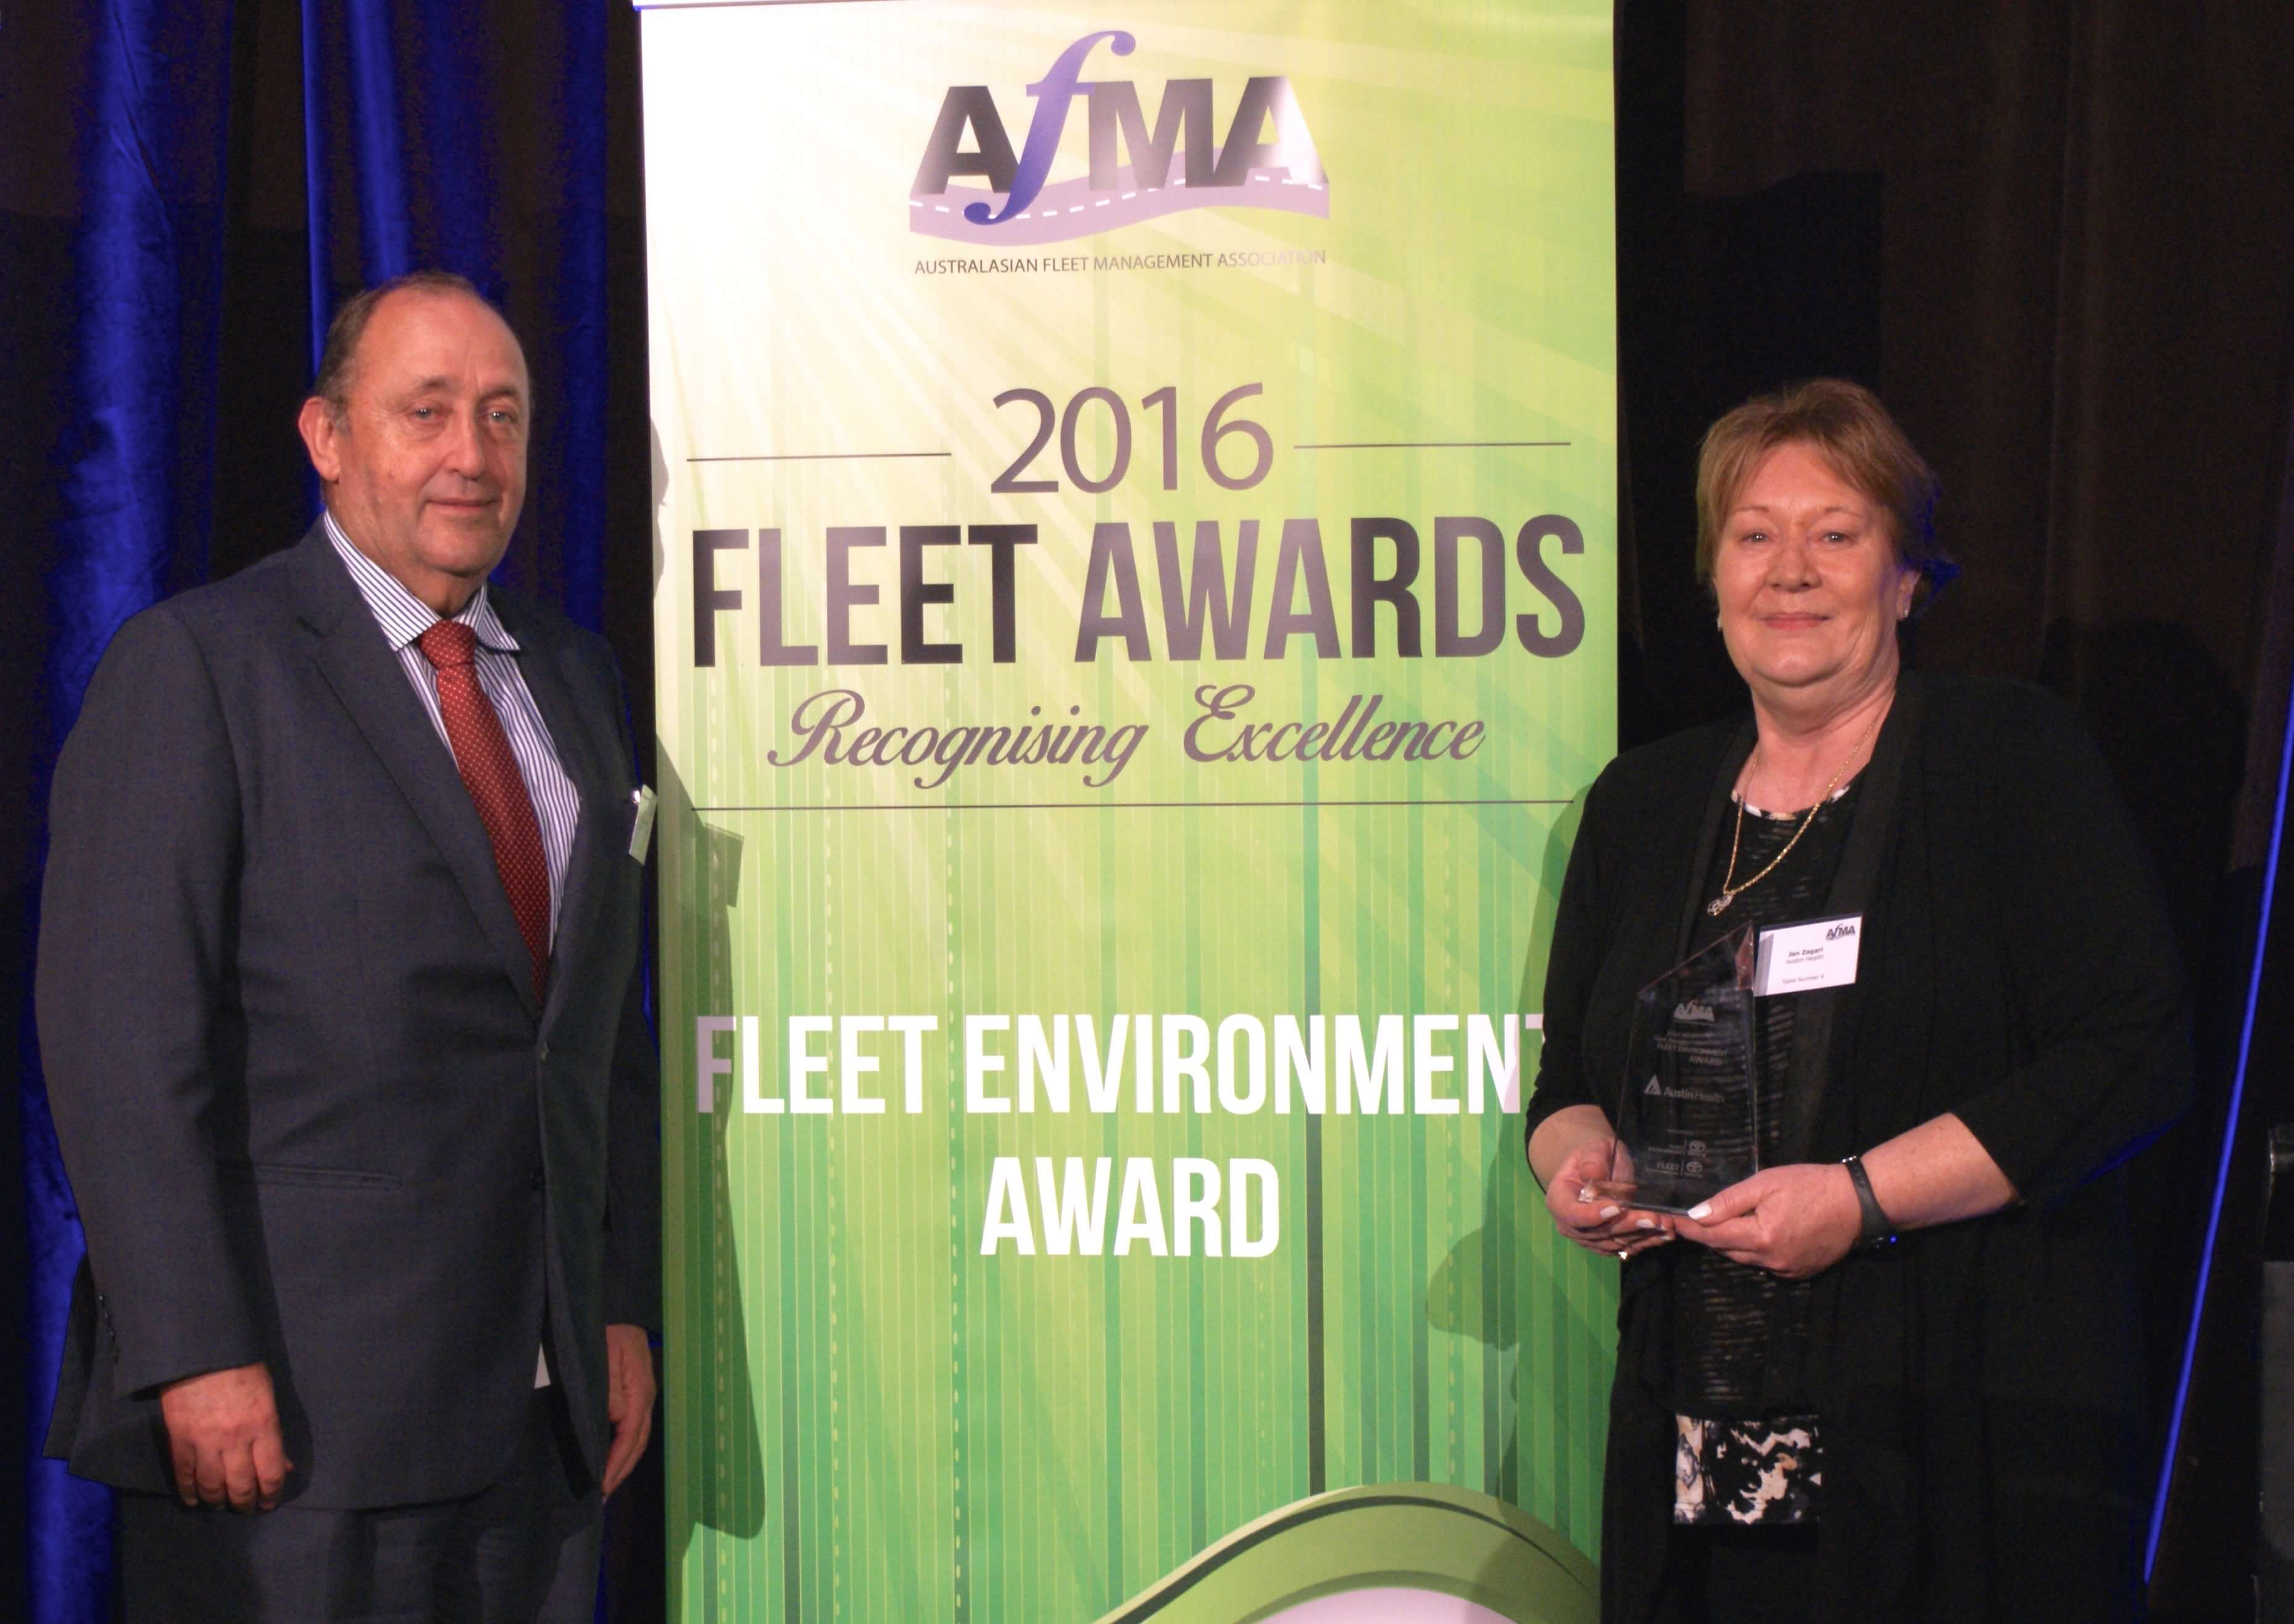 Fleet Environment Award winner Jan Zagari (right)